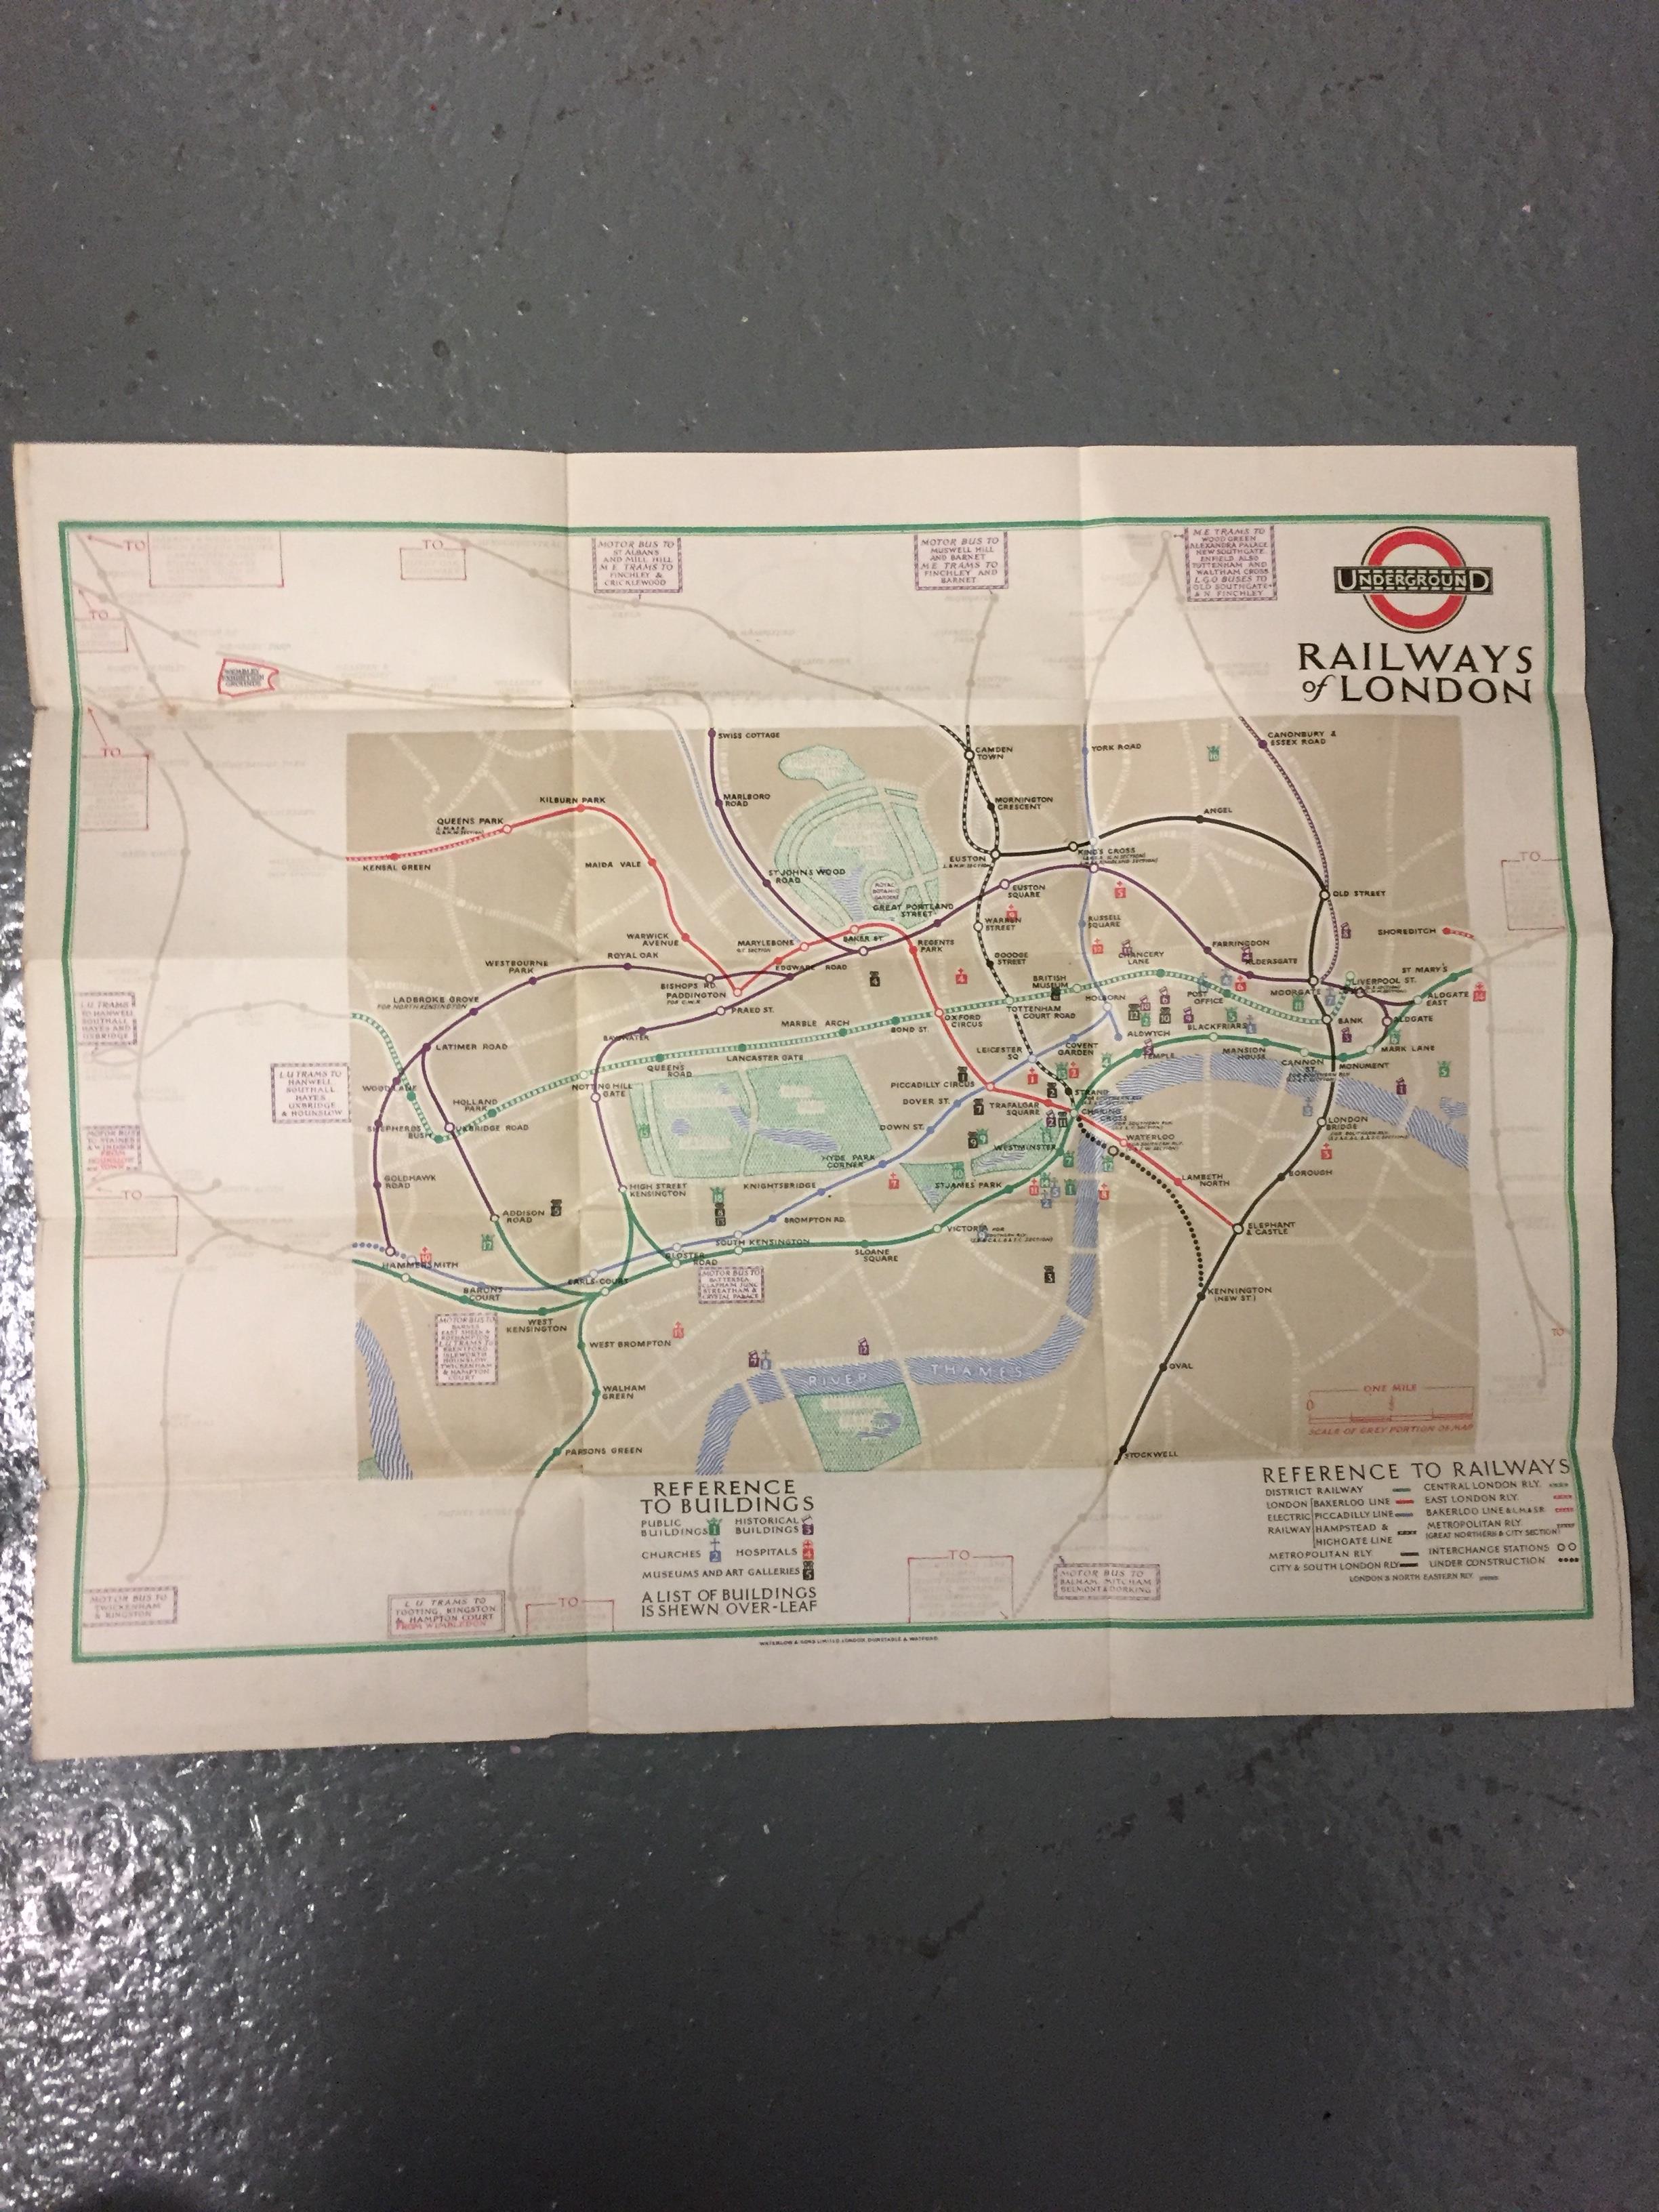 Nine 1910/20s folding pocket maps for London transport,comprising a 1916 General Omnibus Map of some - Image 15 of 15